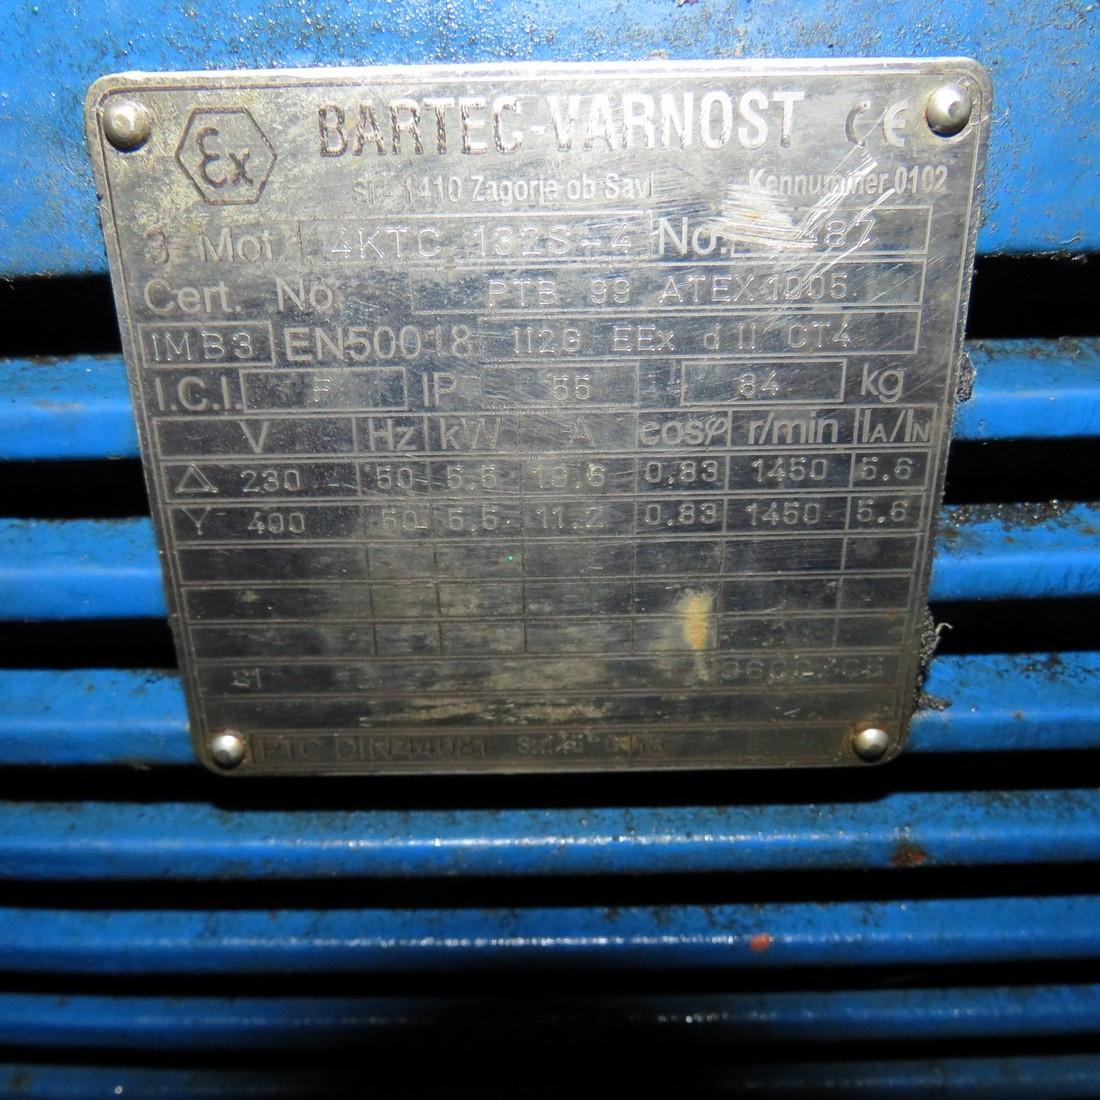 R10JA846 SPECK-PUMPEN Skid vacuum pump - Hp7.5 - Rpm1500